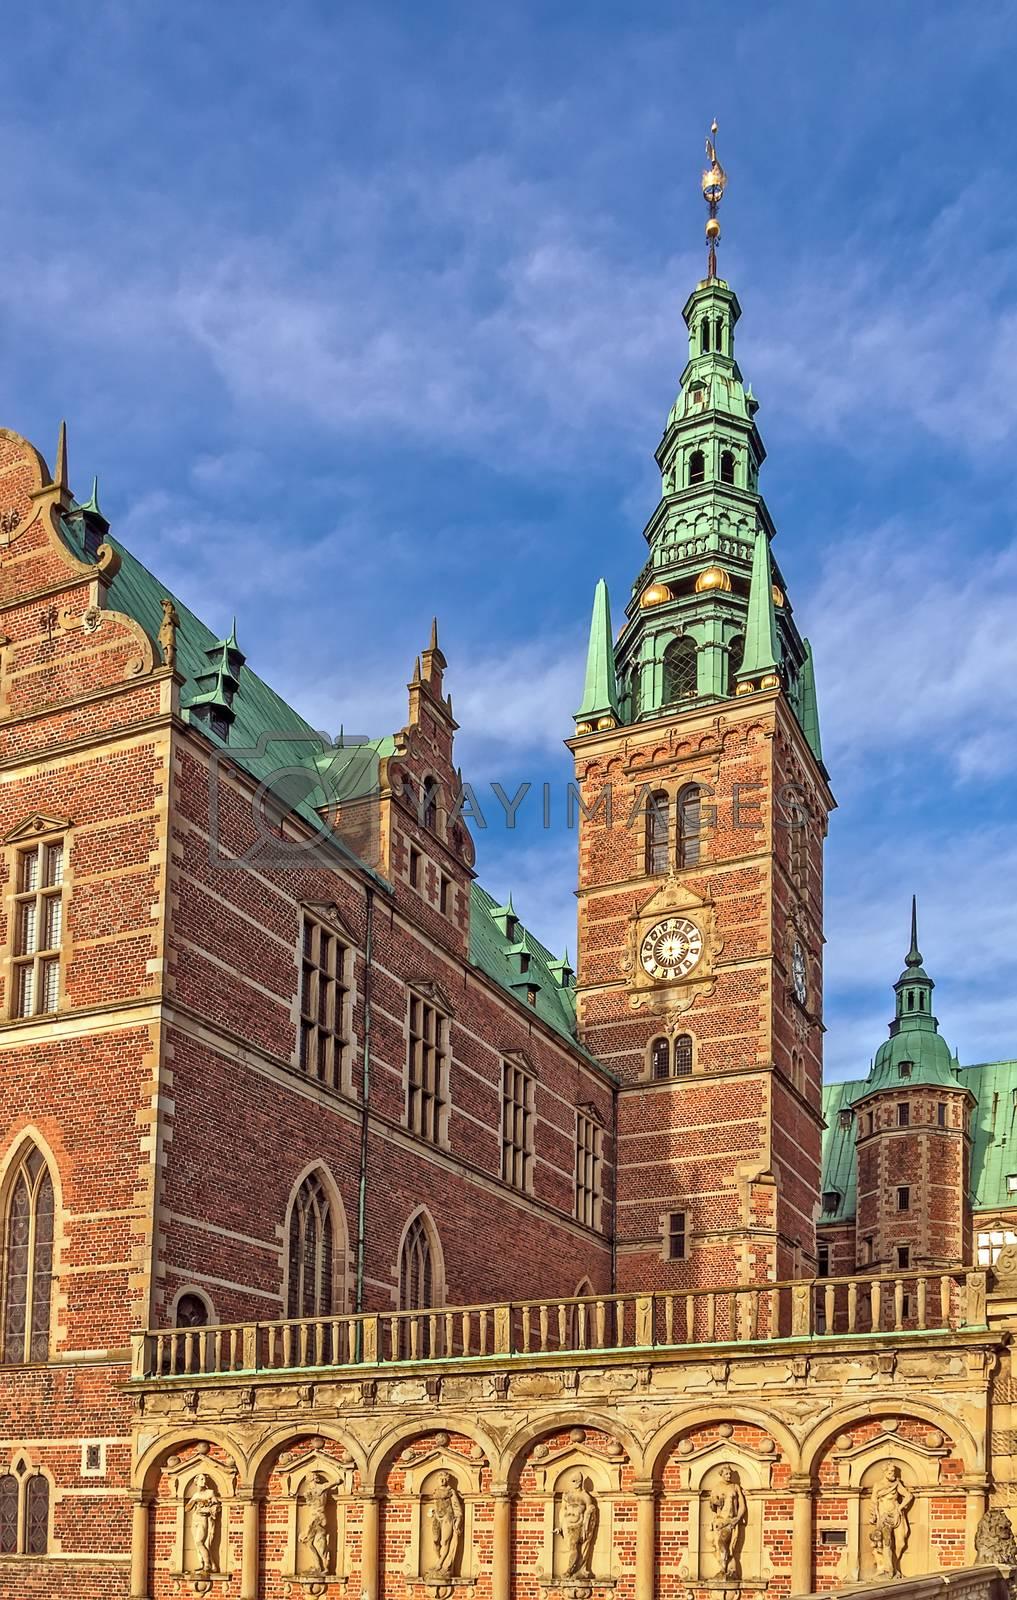 Frederiksborg Palace, Denmark by borisb17